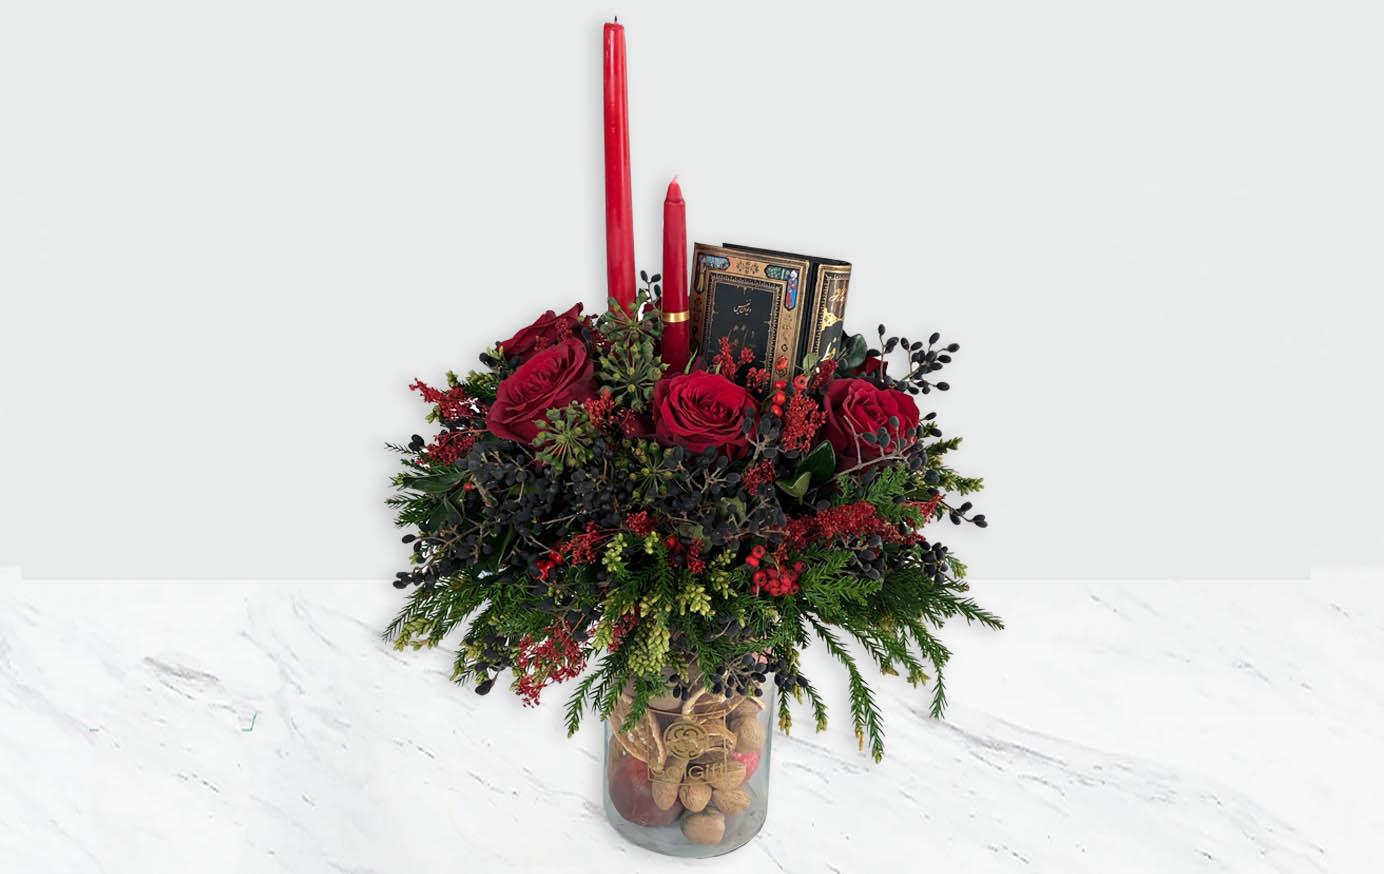 گلدان شیشه ای شب یلدا